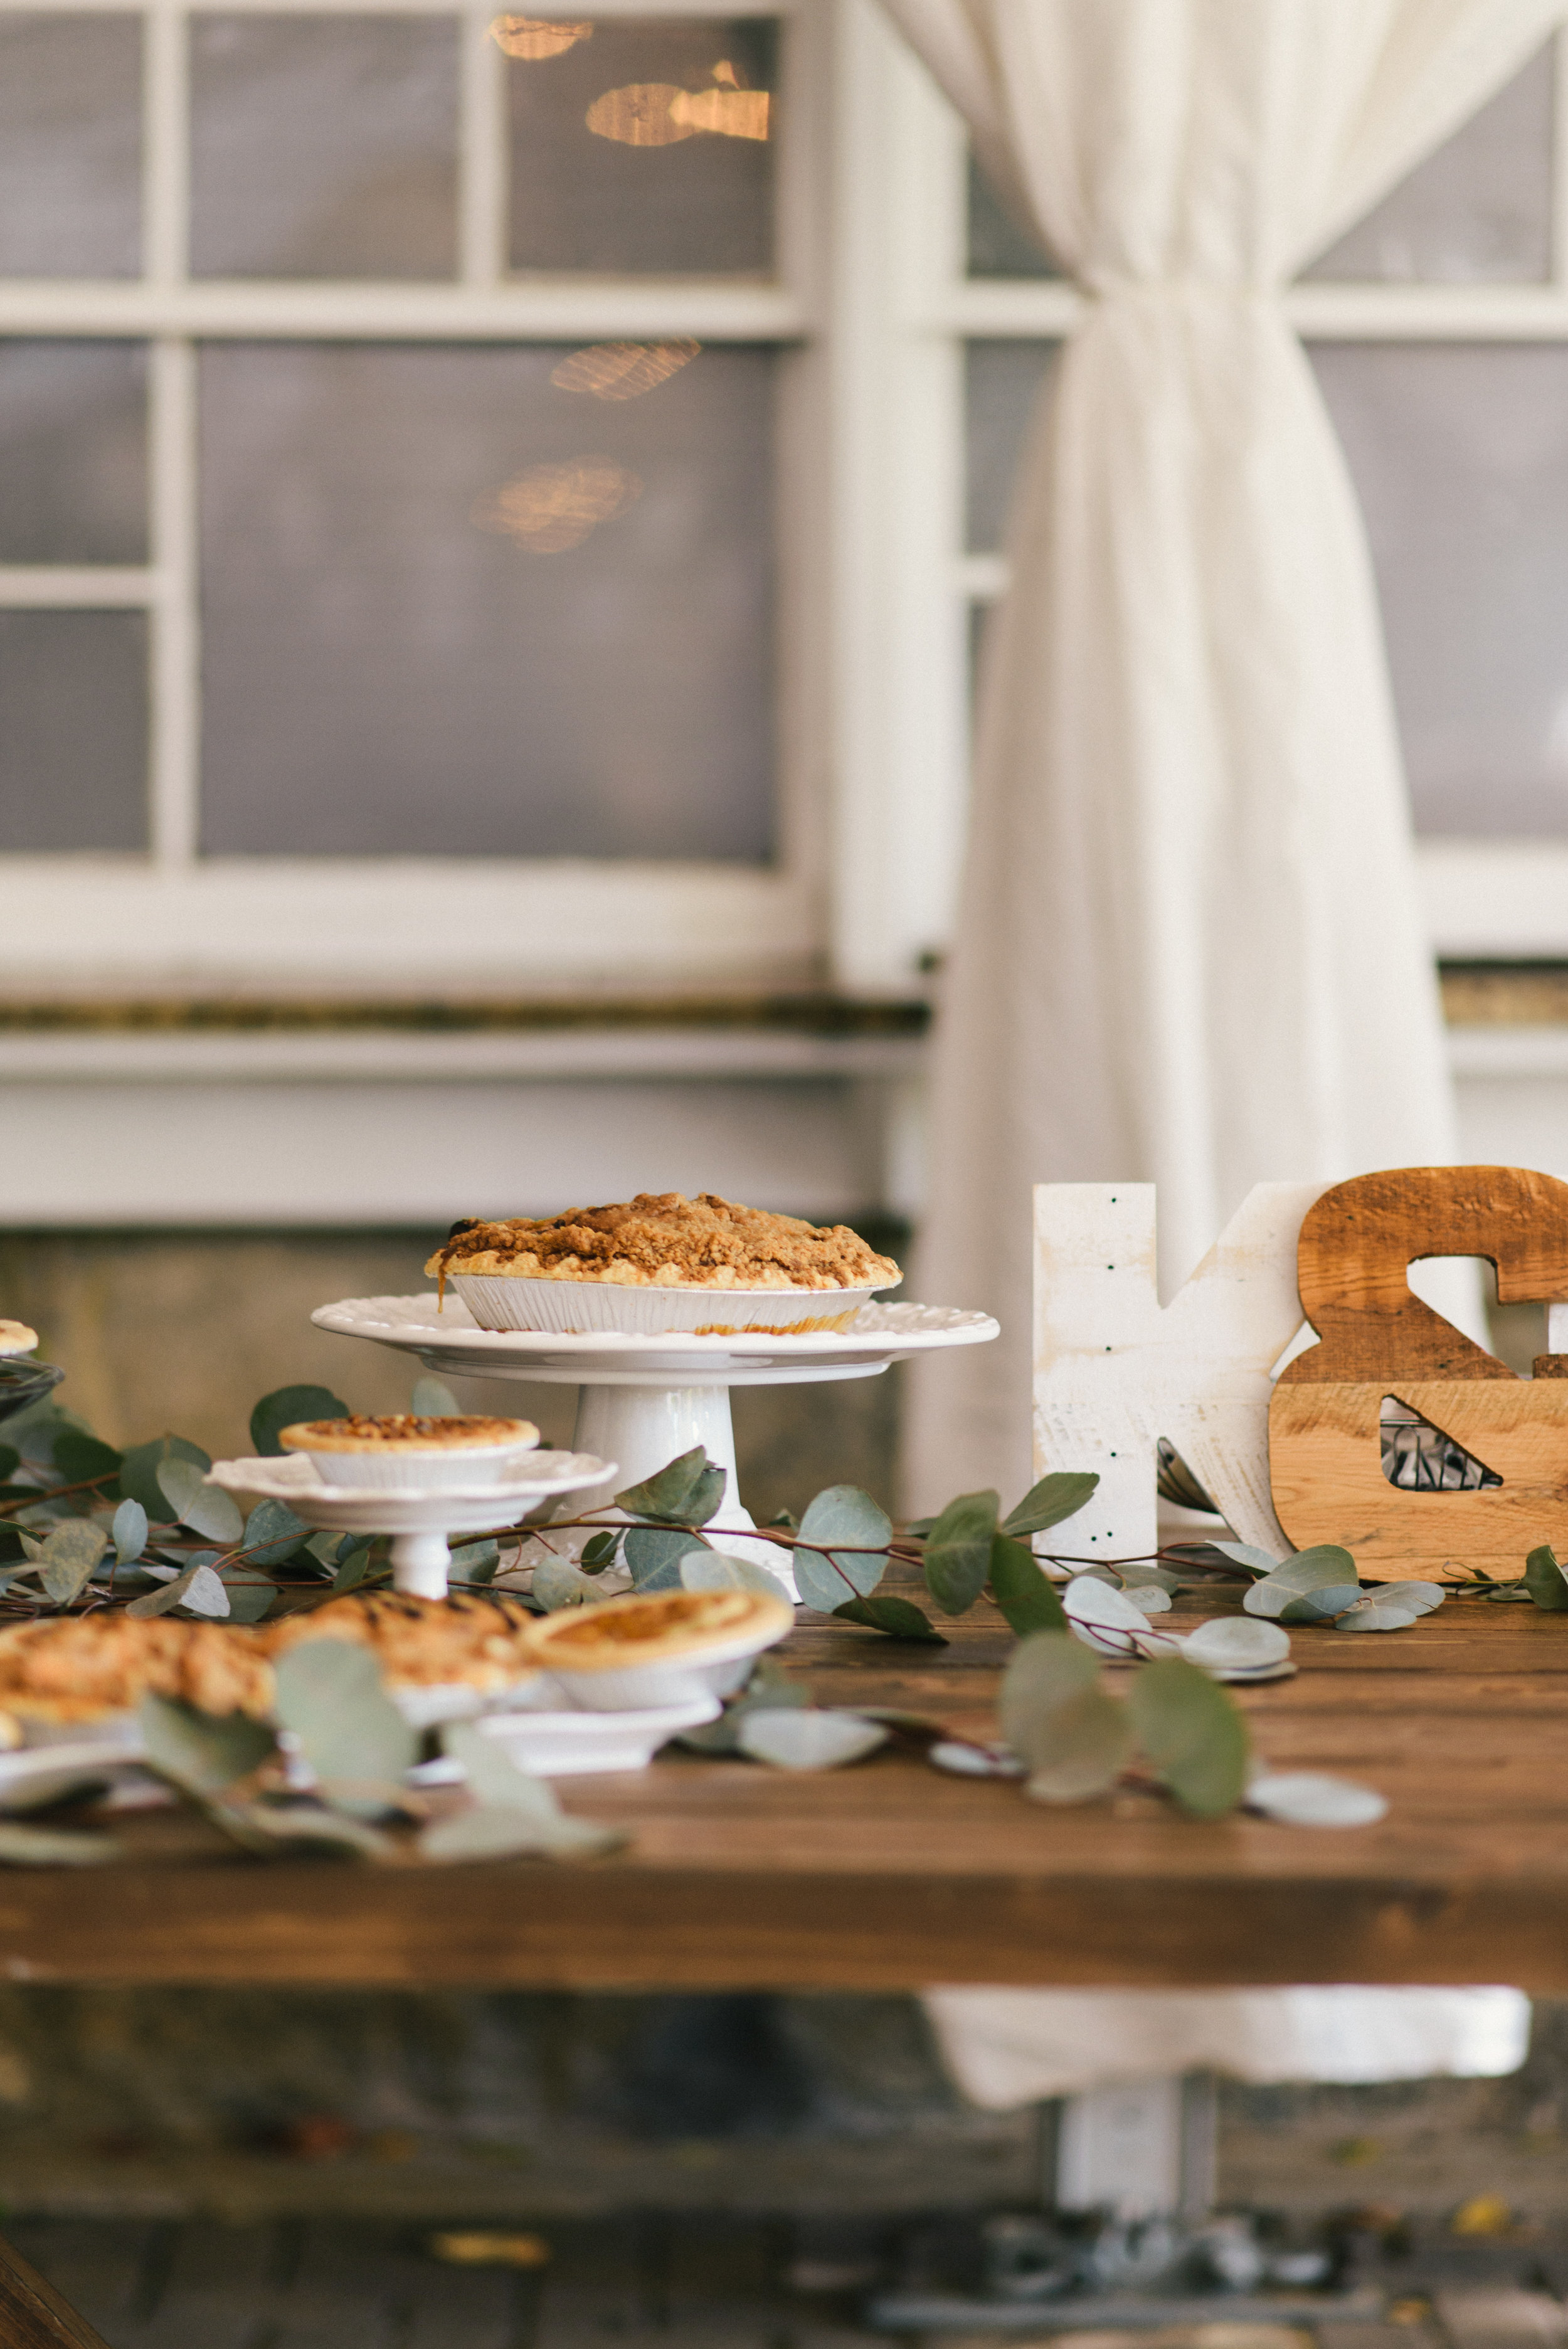 kristin-and-peter-atlanta-georgia-wedding-october-8th-2016 (244 of 1068).jpg